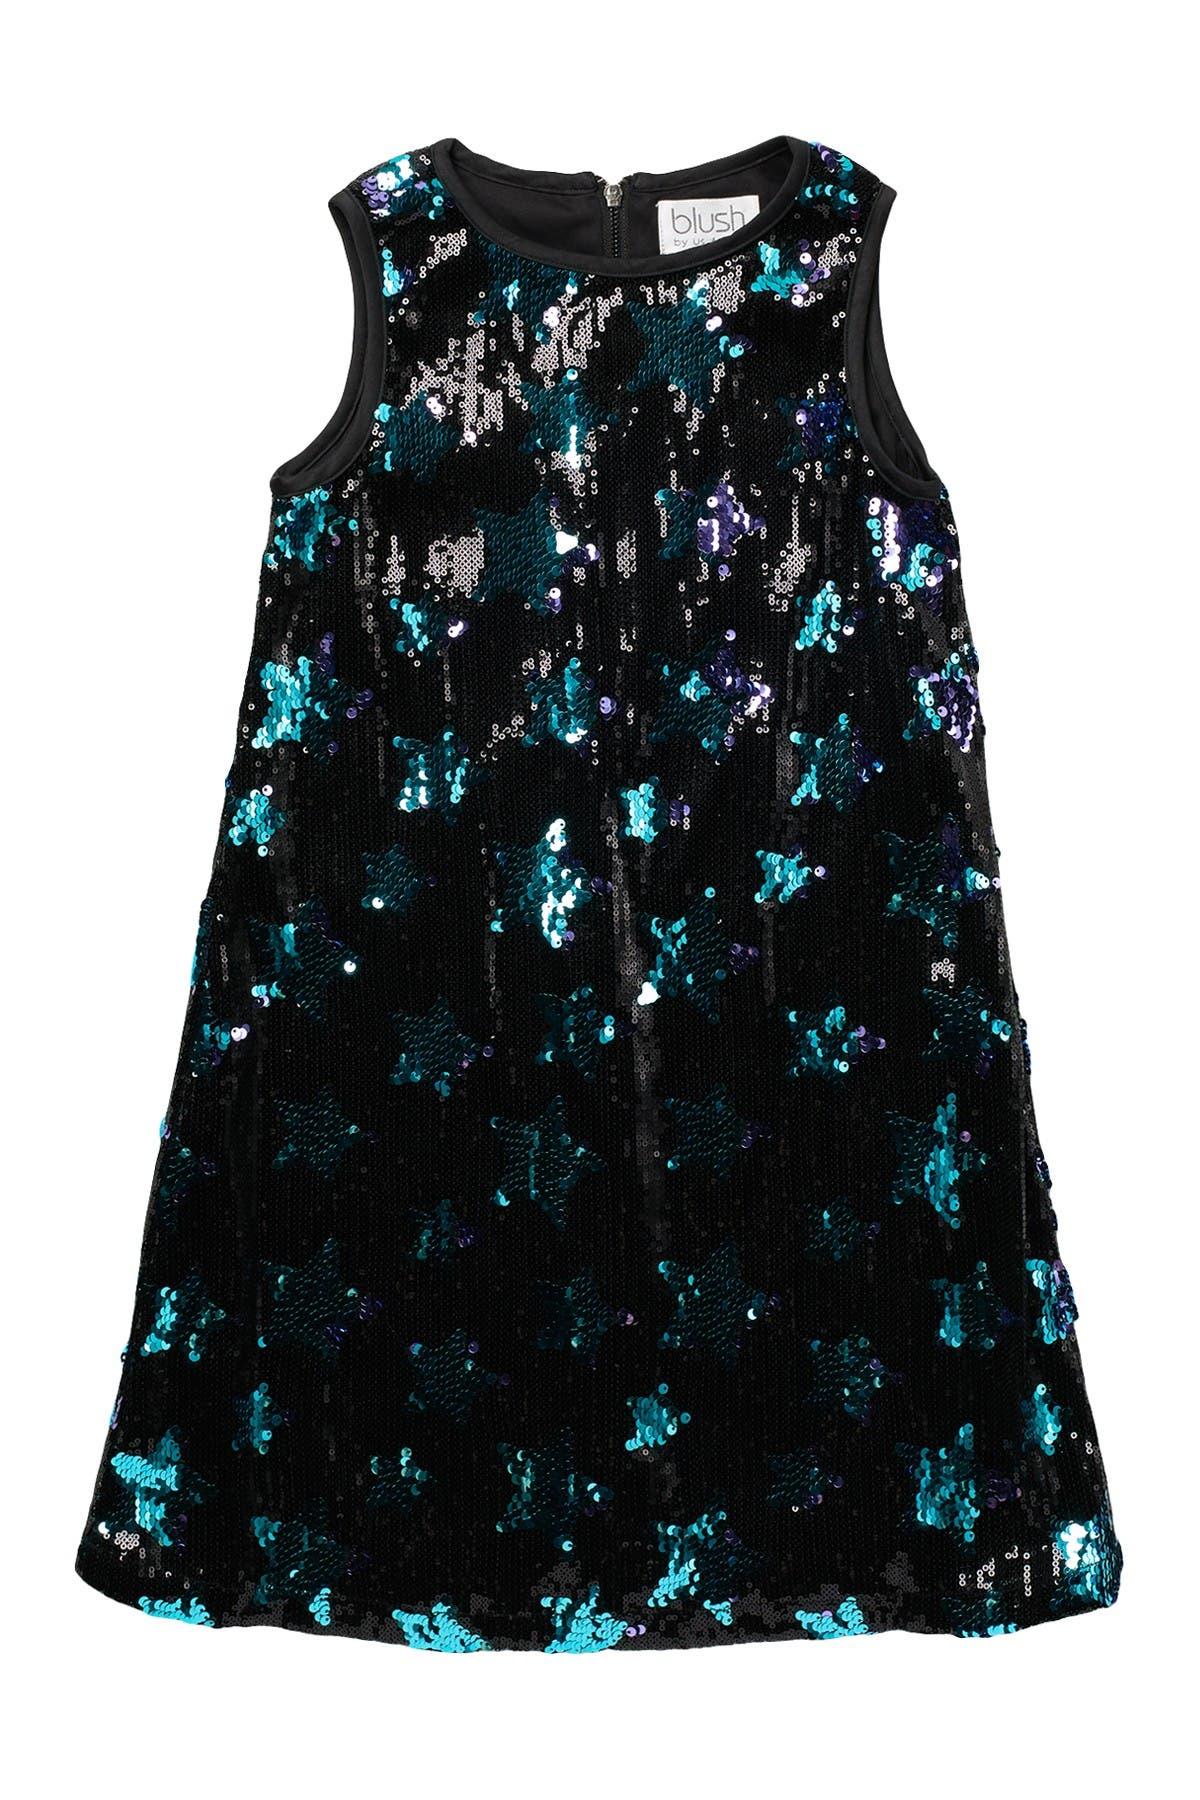 Image of Blush by Us Angels Sleeveless Sequin Sheath Dress